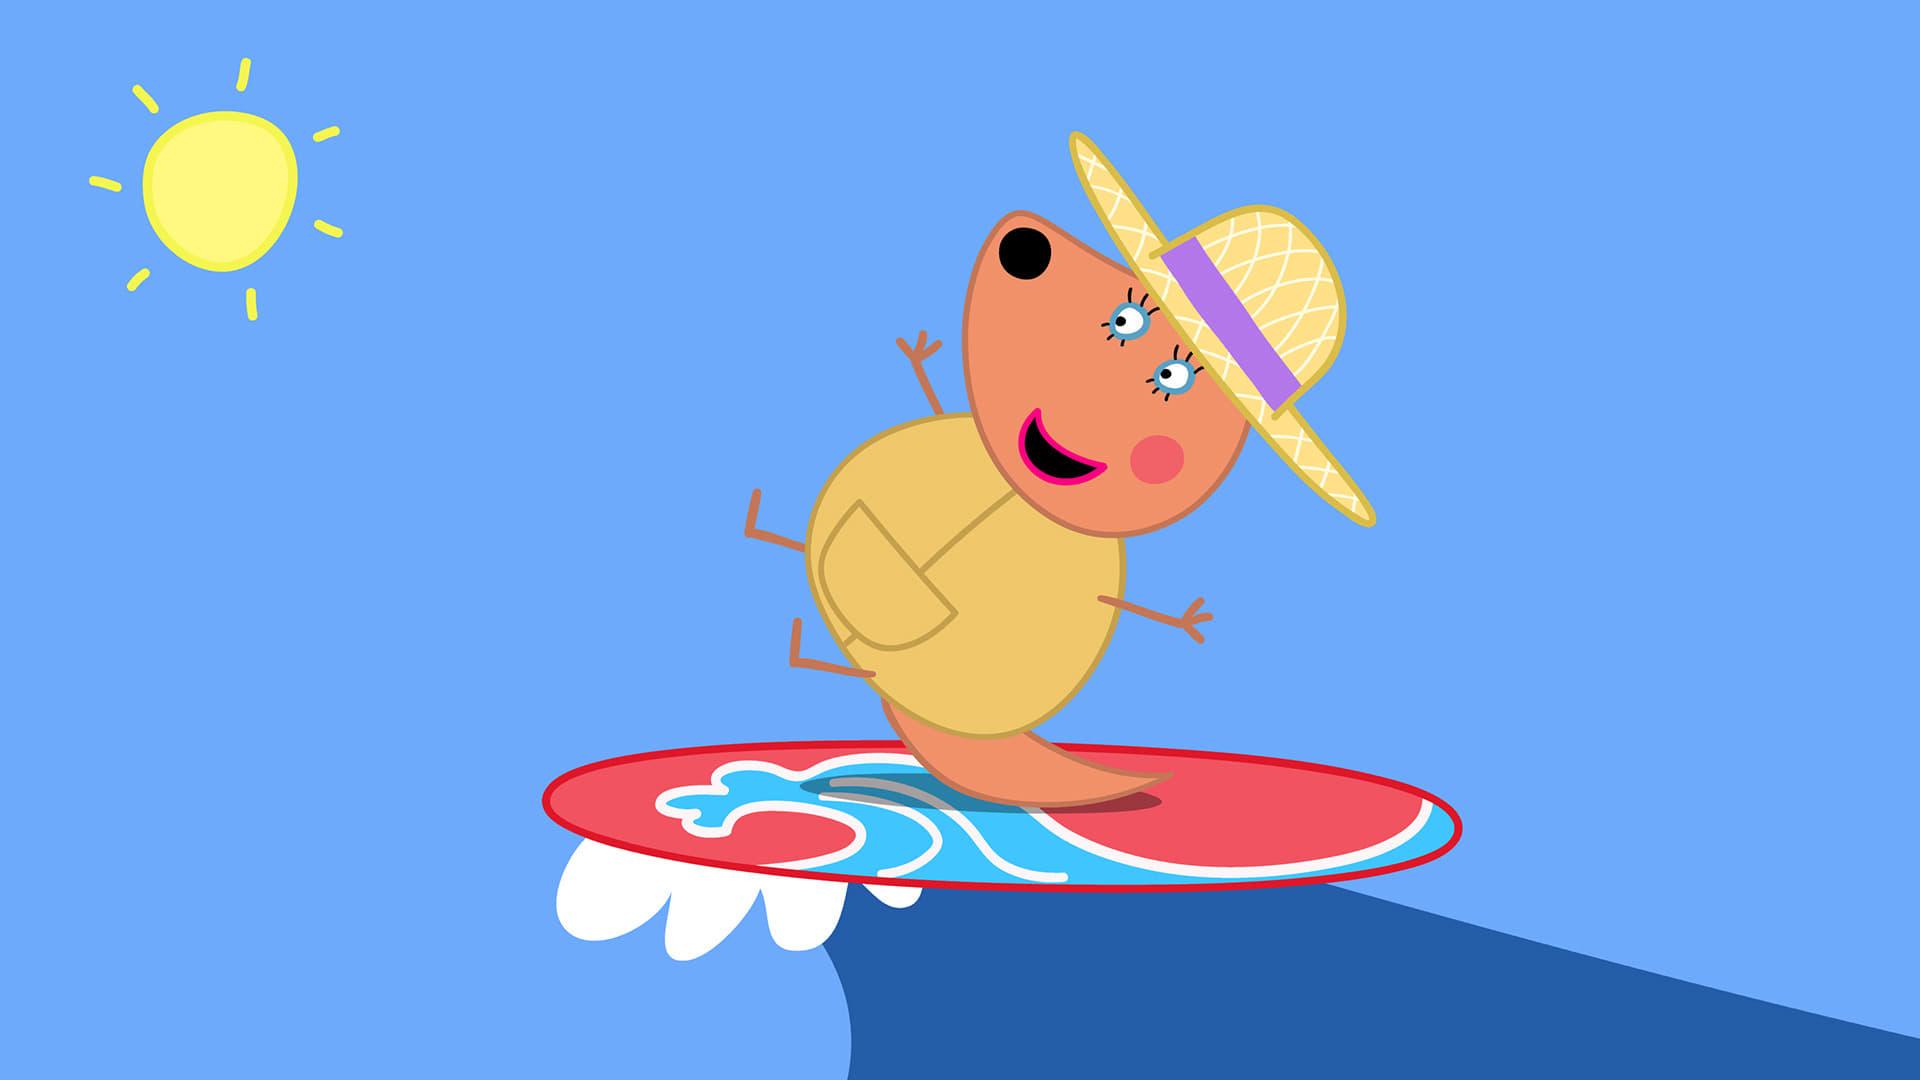 Peppa Pig Season 5 :Episode 20  Australia Part 2 - Surfing